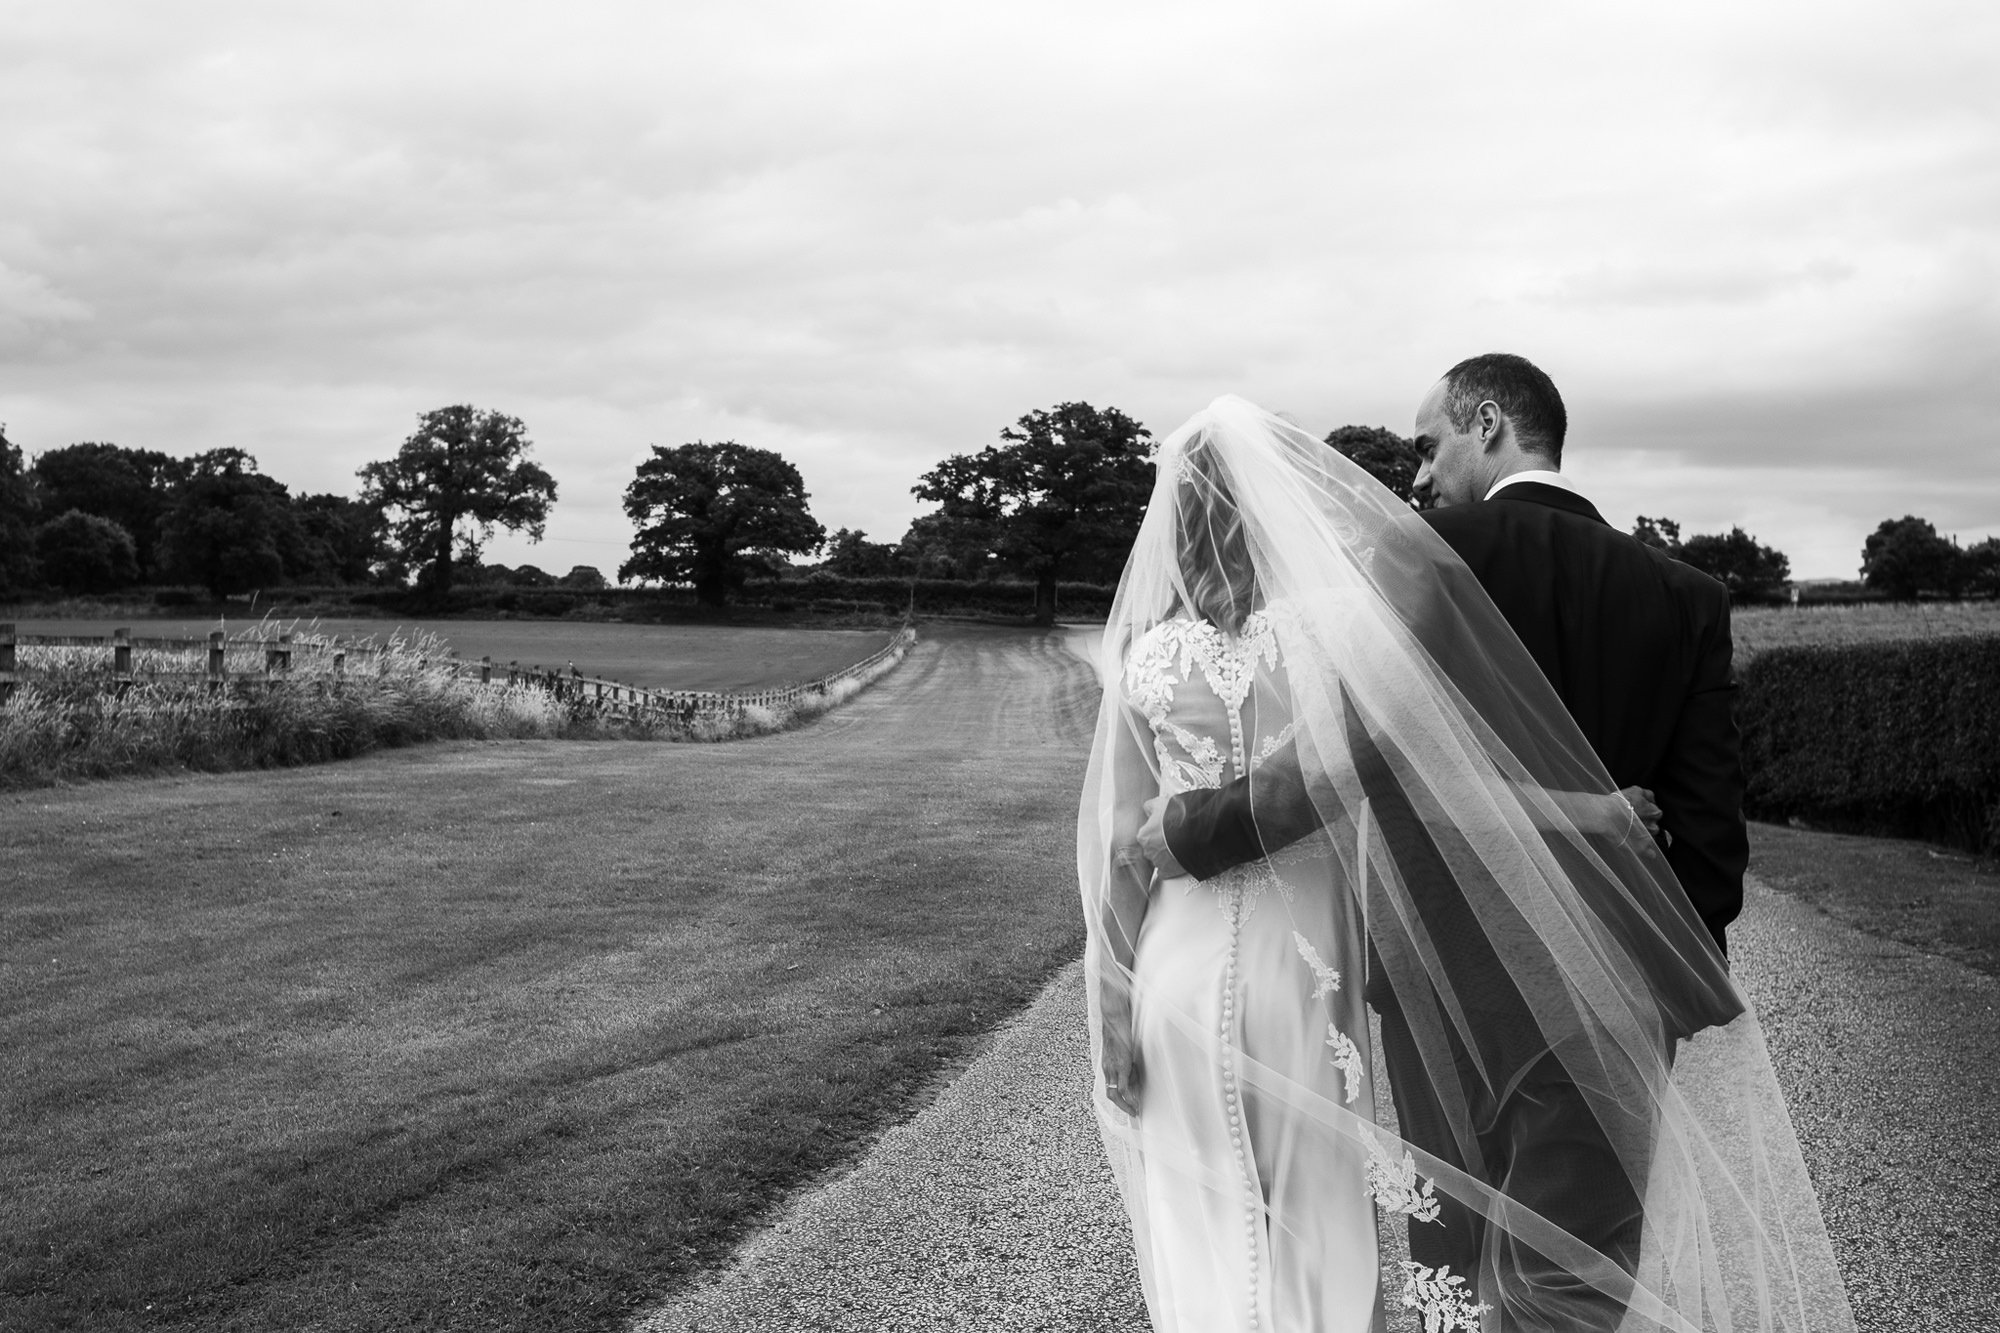 Leica M10 weedding photographer